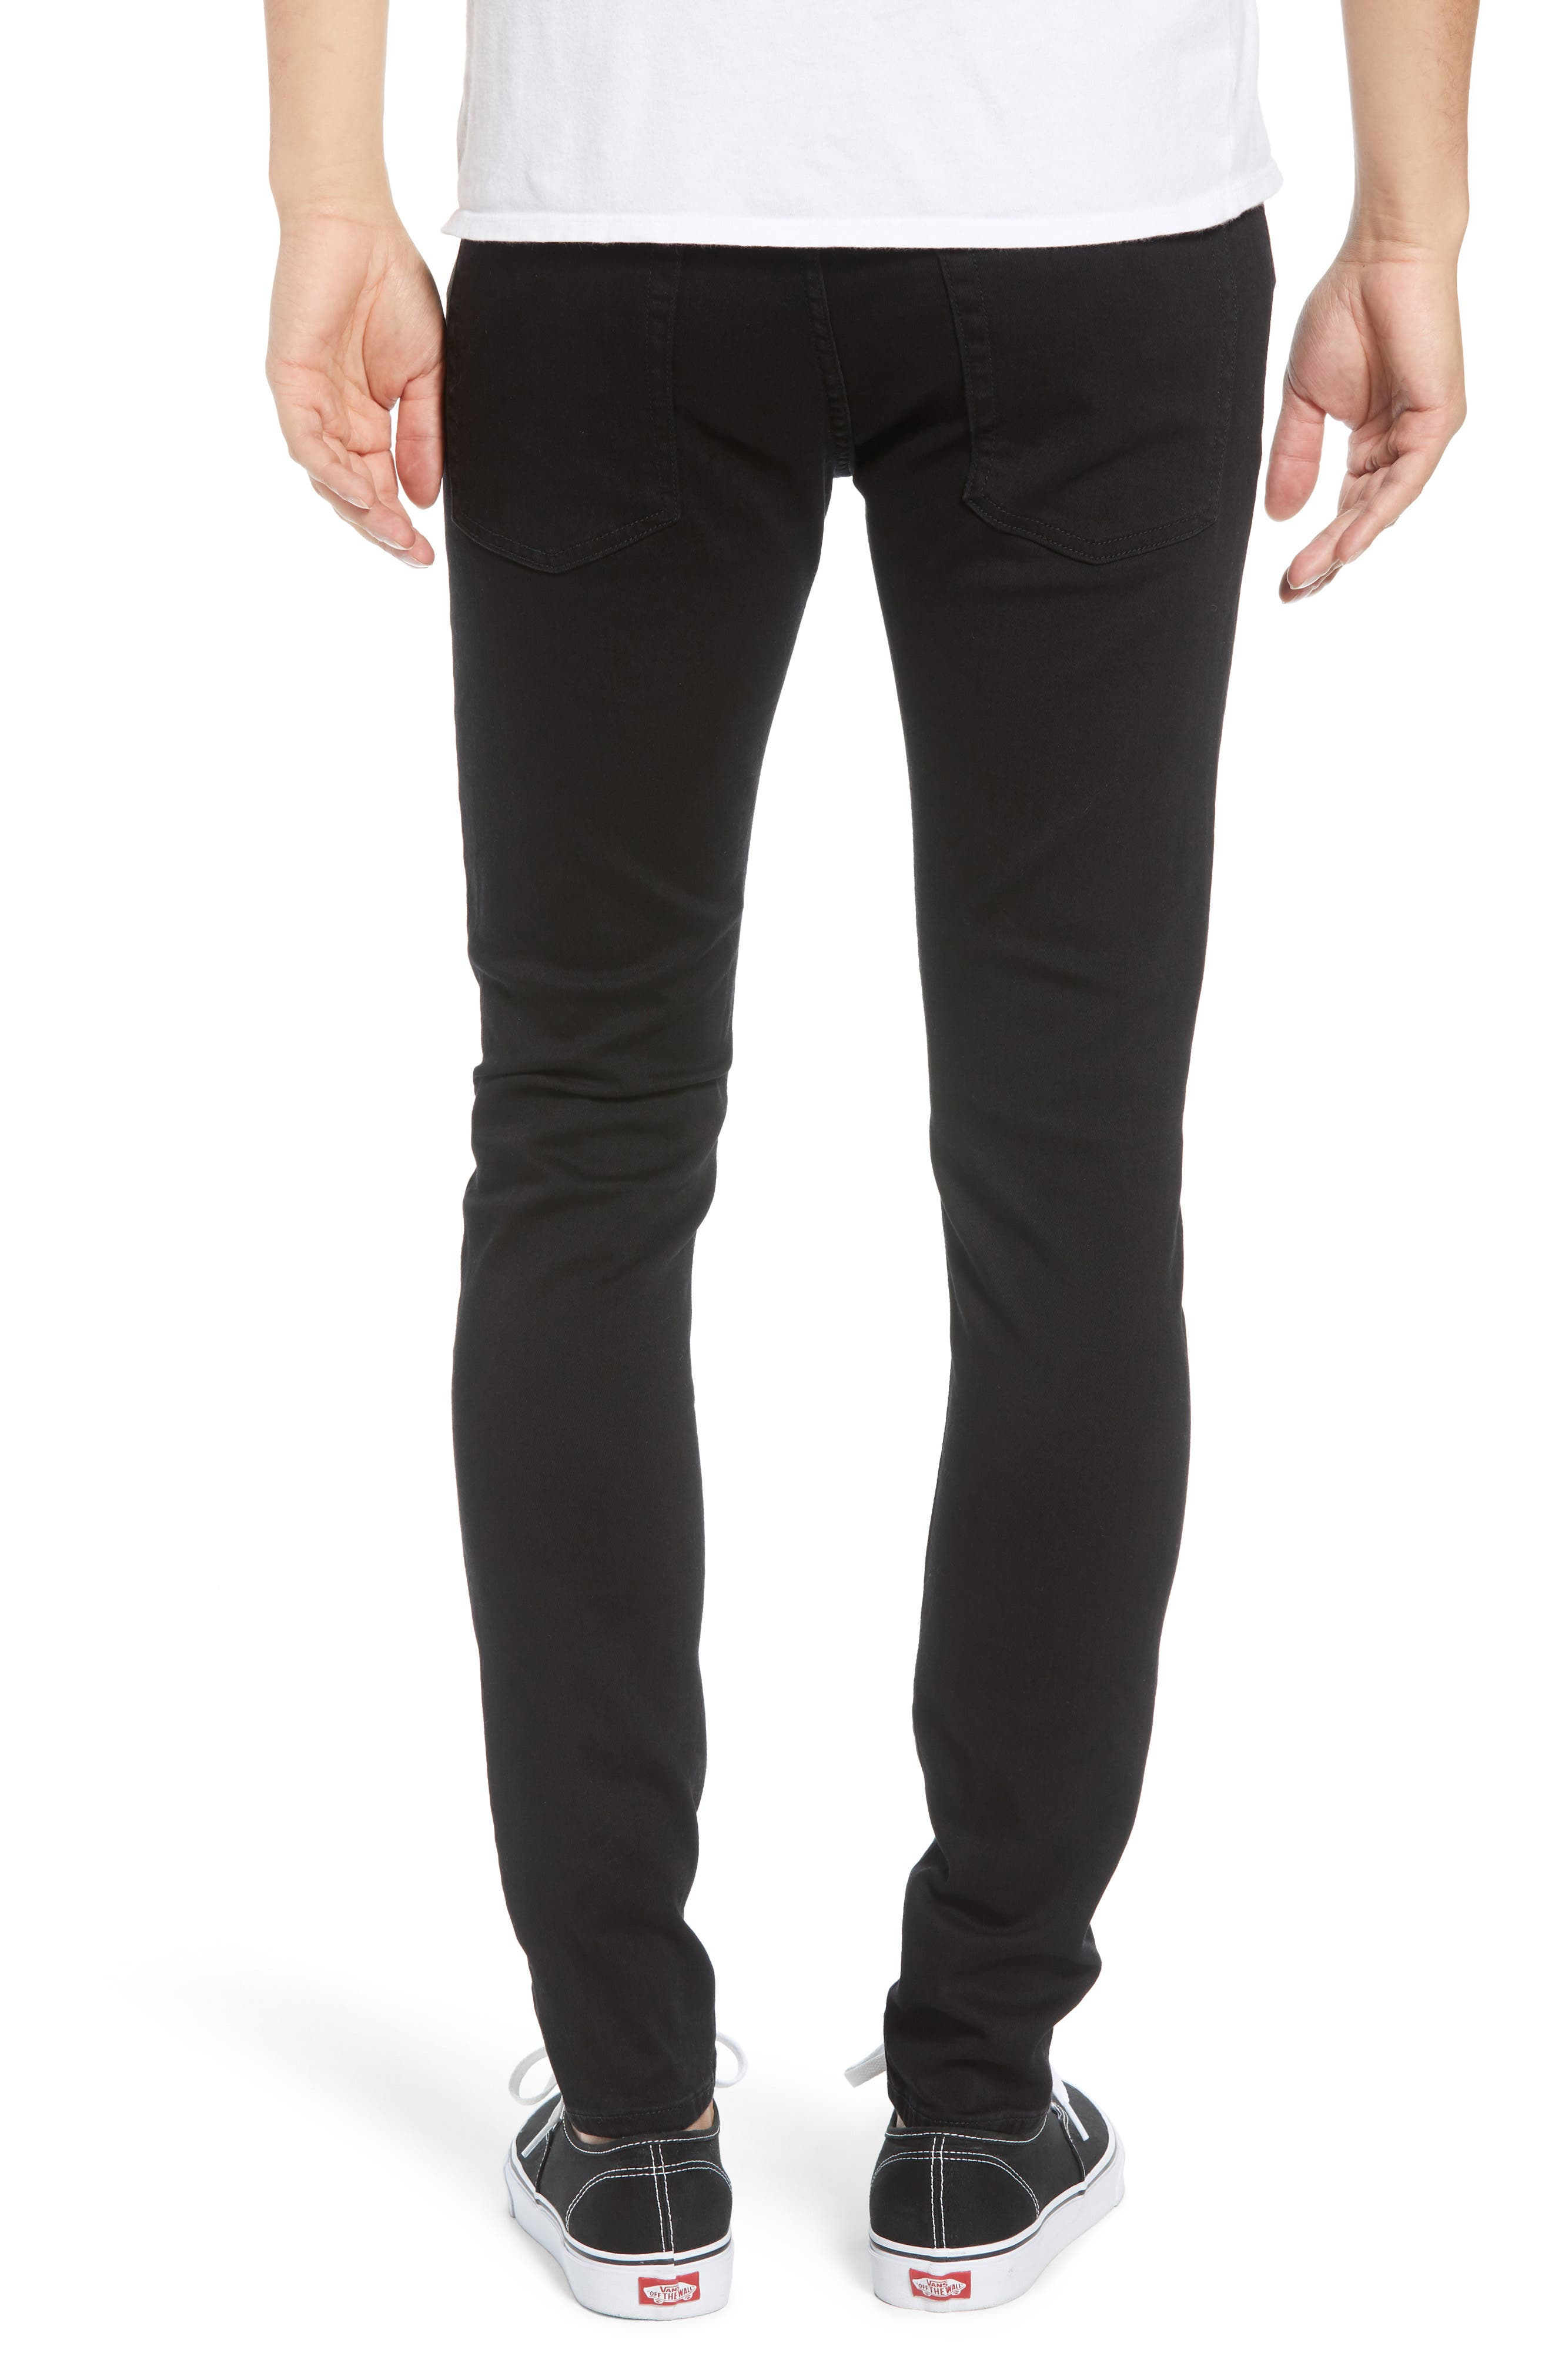 Destroyer Ripped Slim Fit Jeans,                             Alternate thumbnail 2, color,                             BLACK